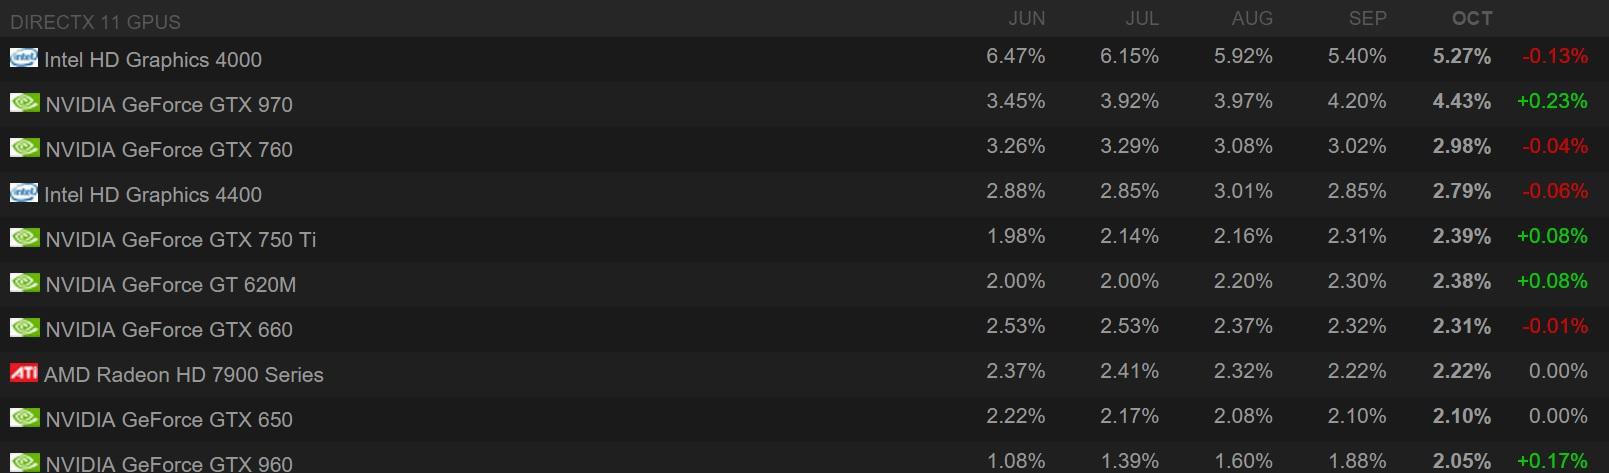 Intel og Nvidia dominerer.